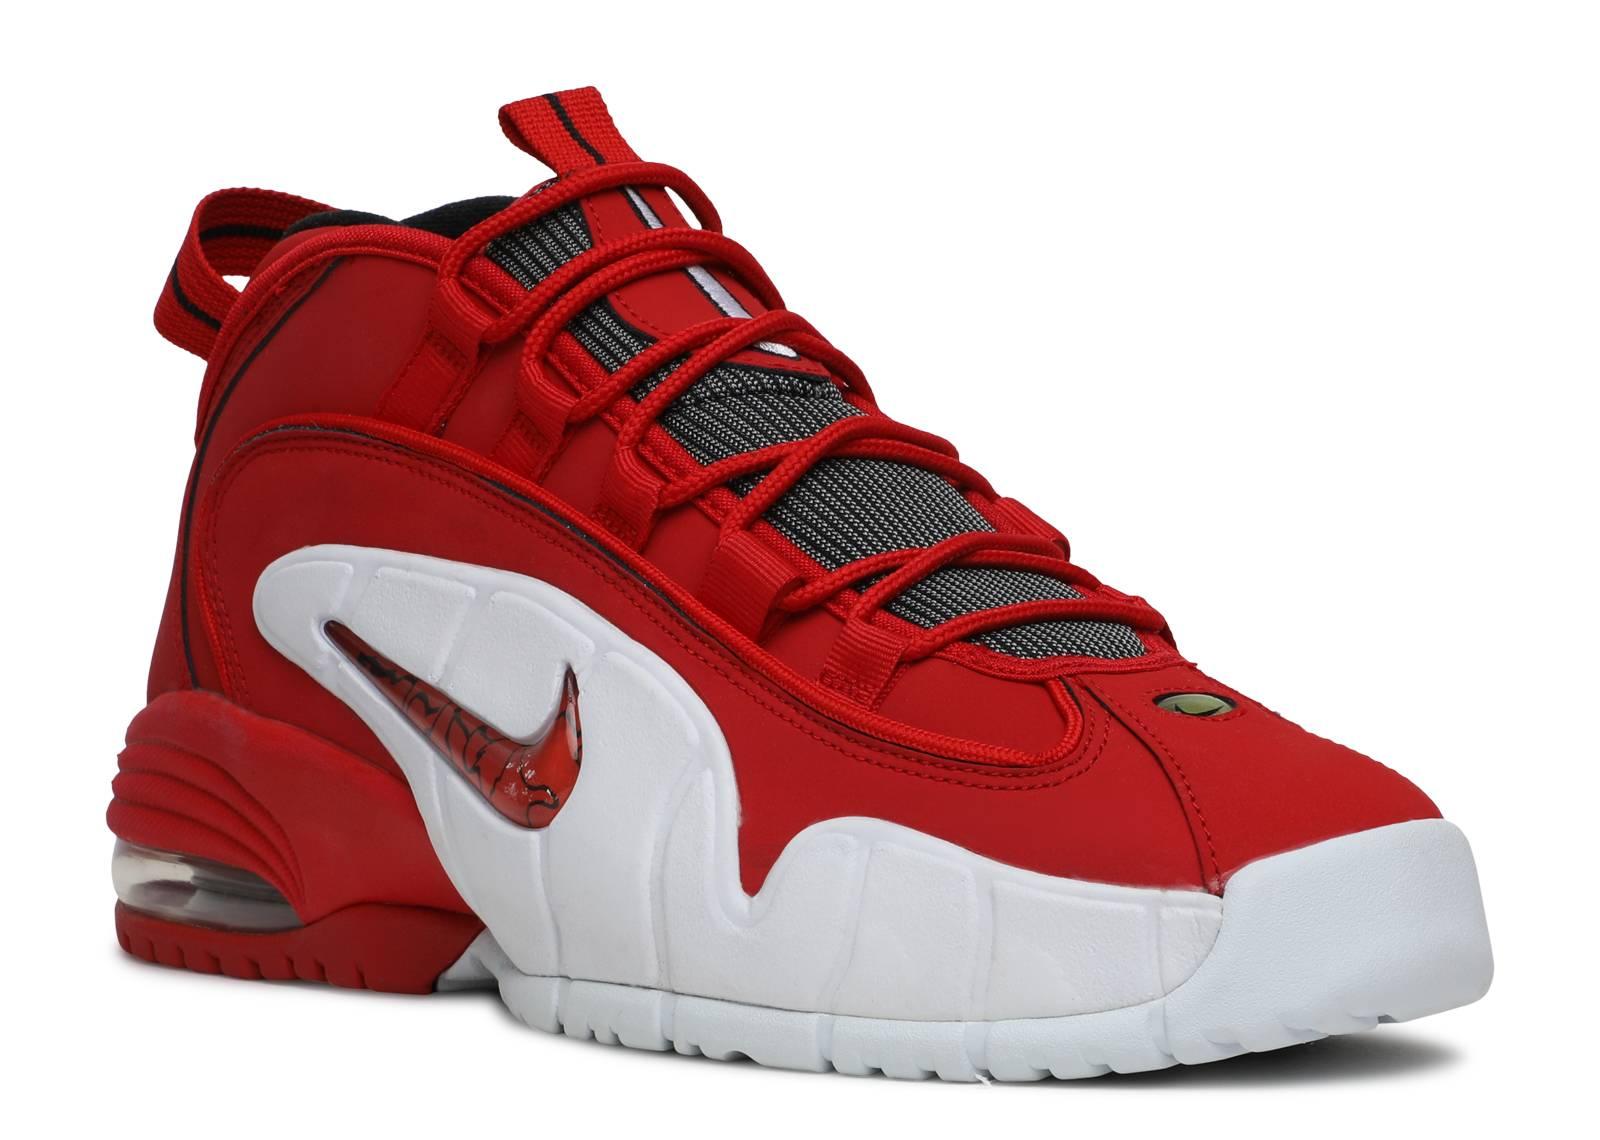 hot sale online df5aa 1af32 air max red white black